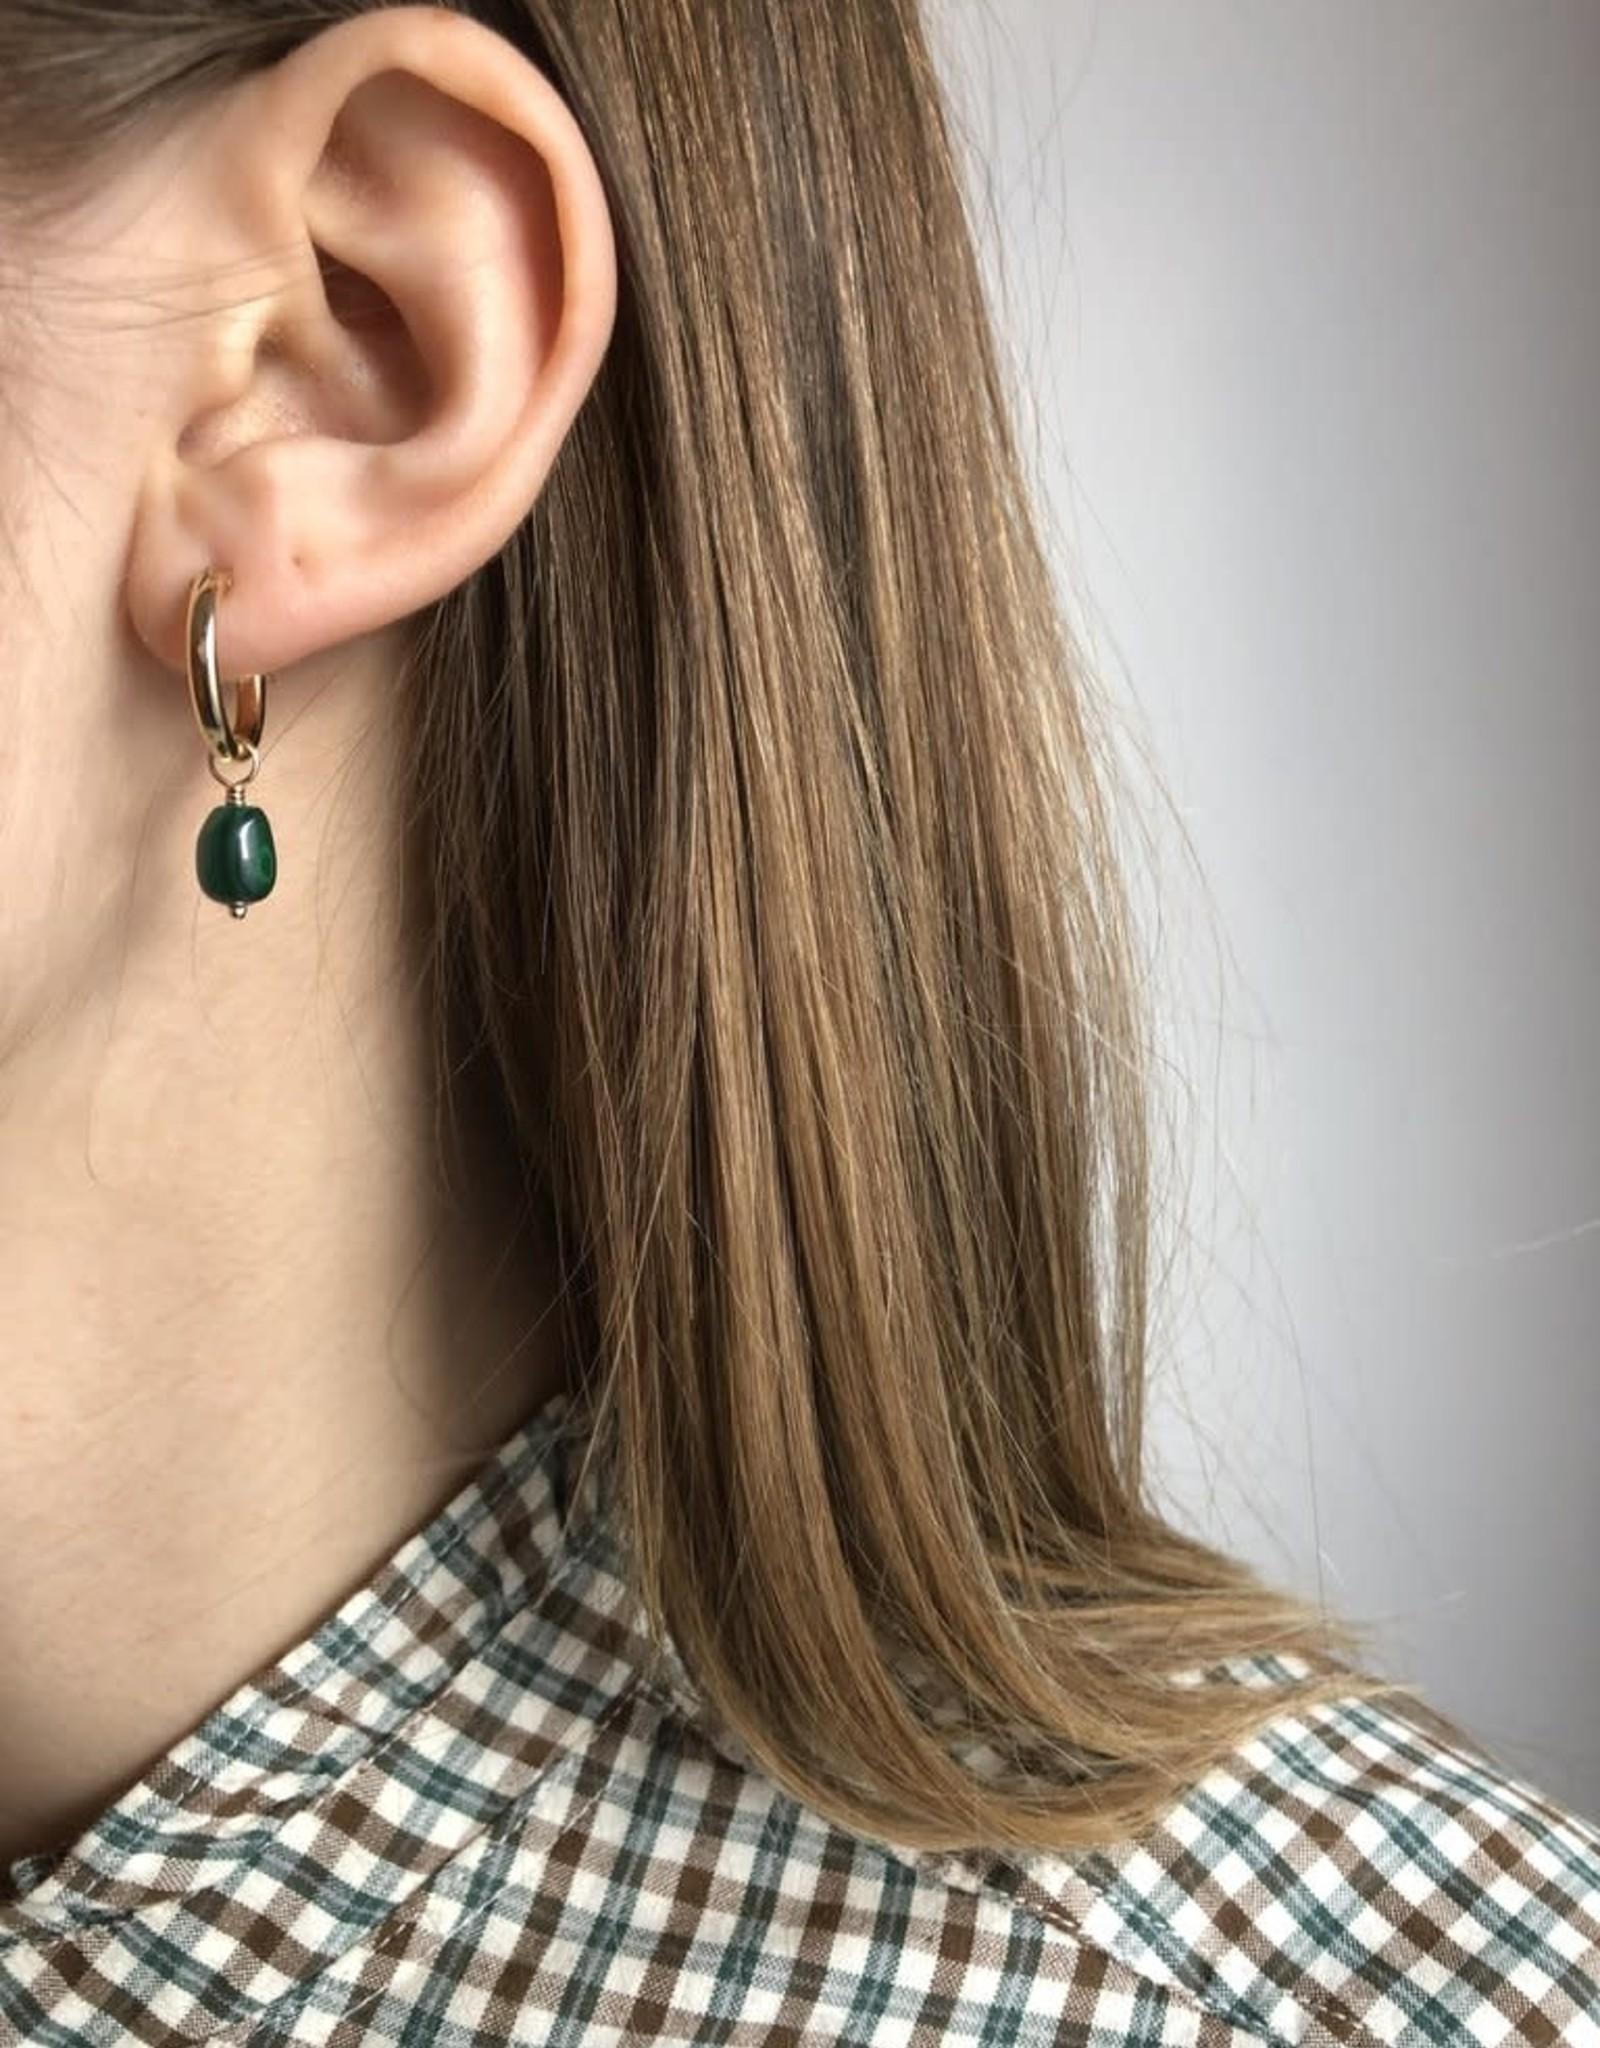 Flora Ciccarelli Anneaux 15mm - Malachite ovale